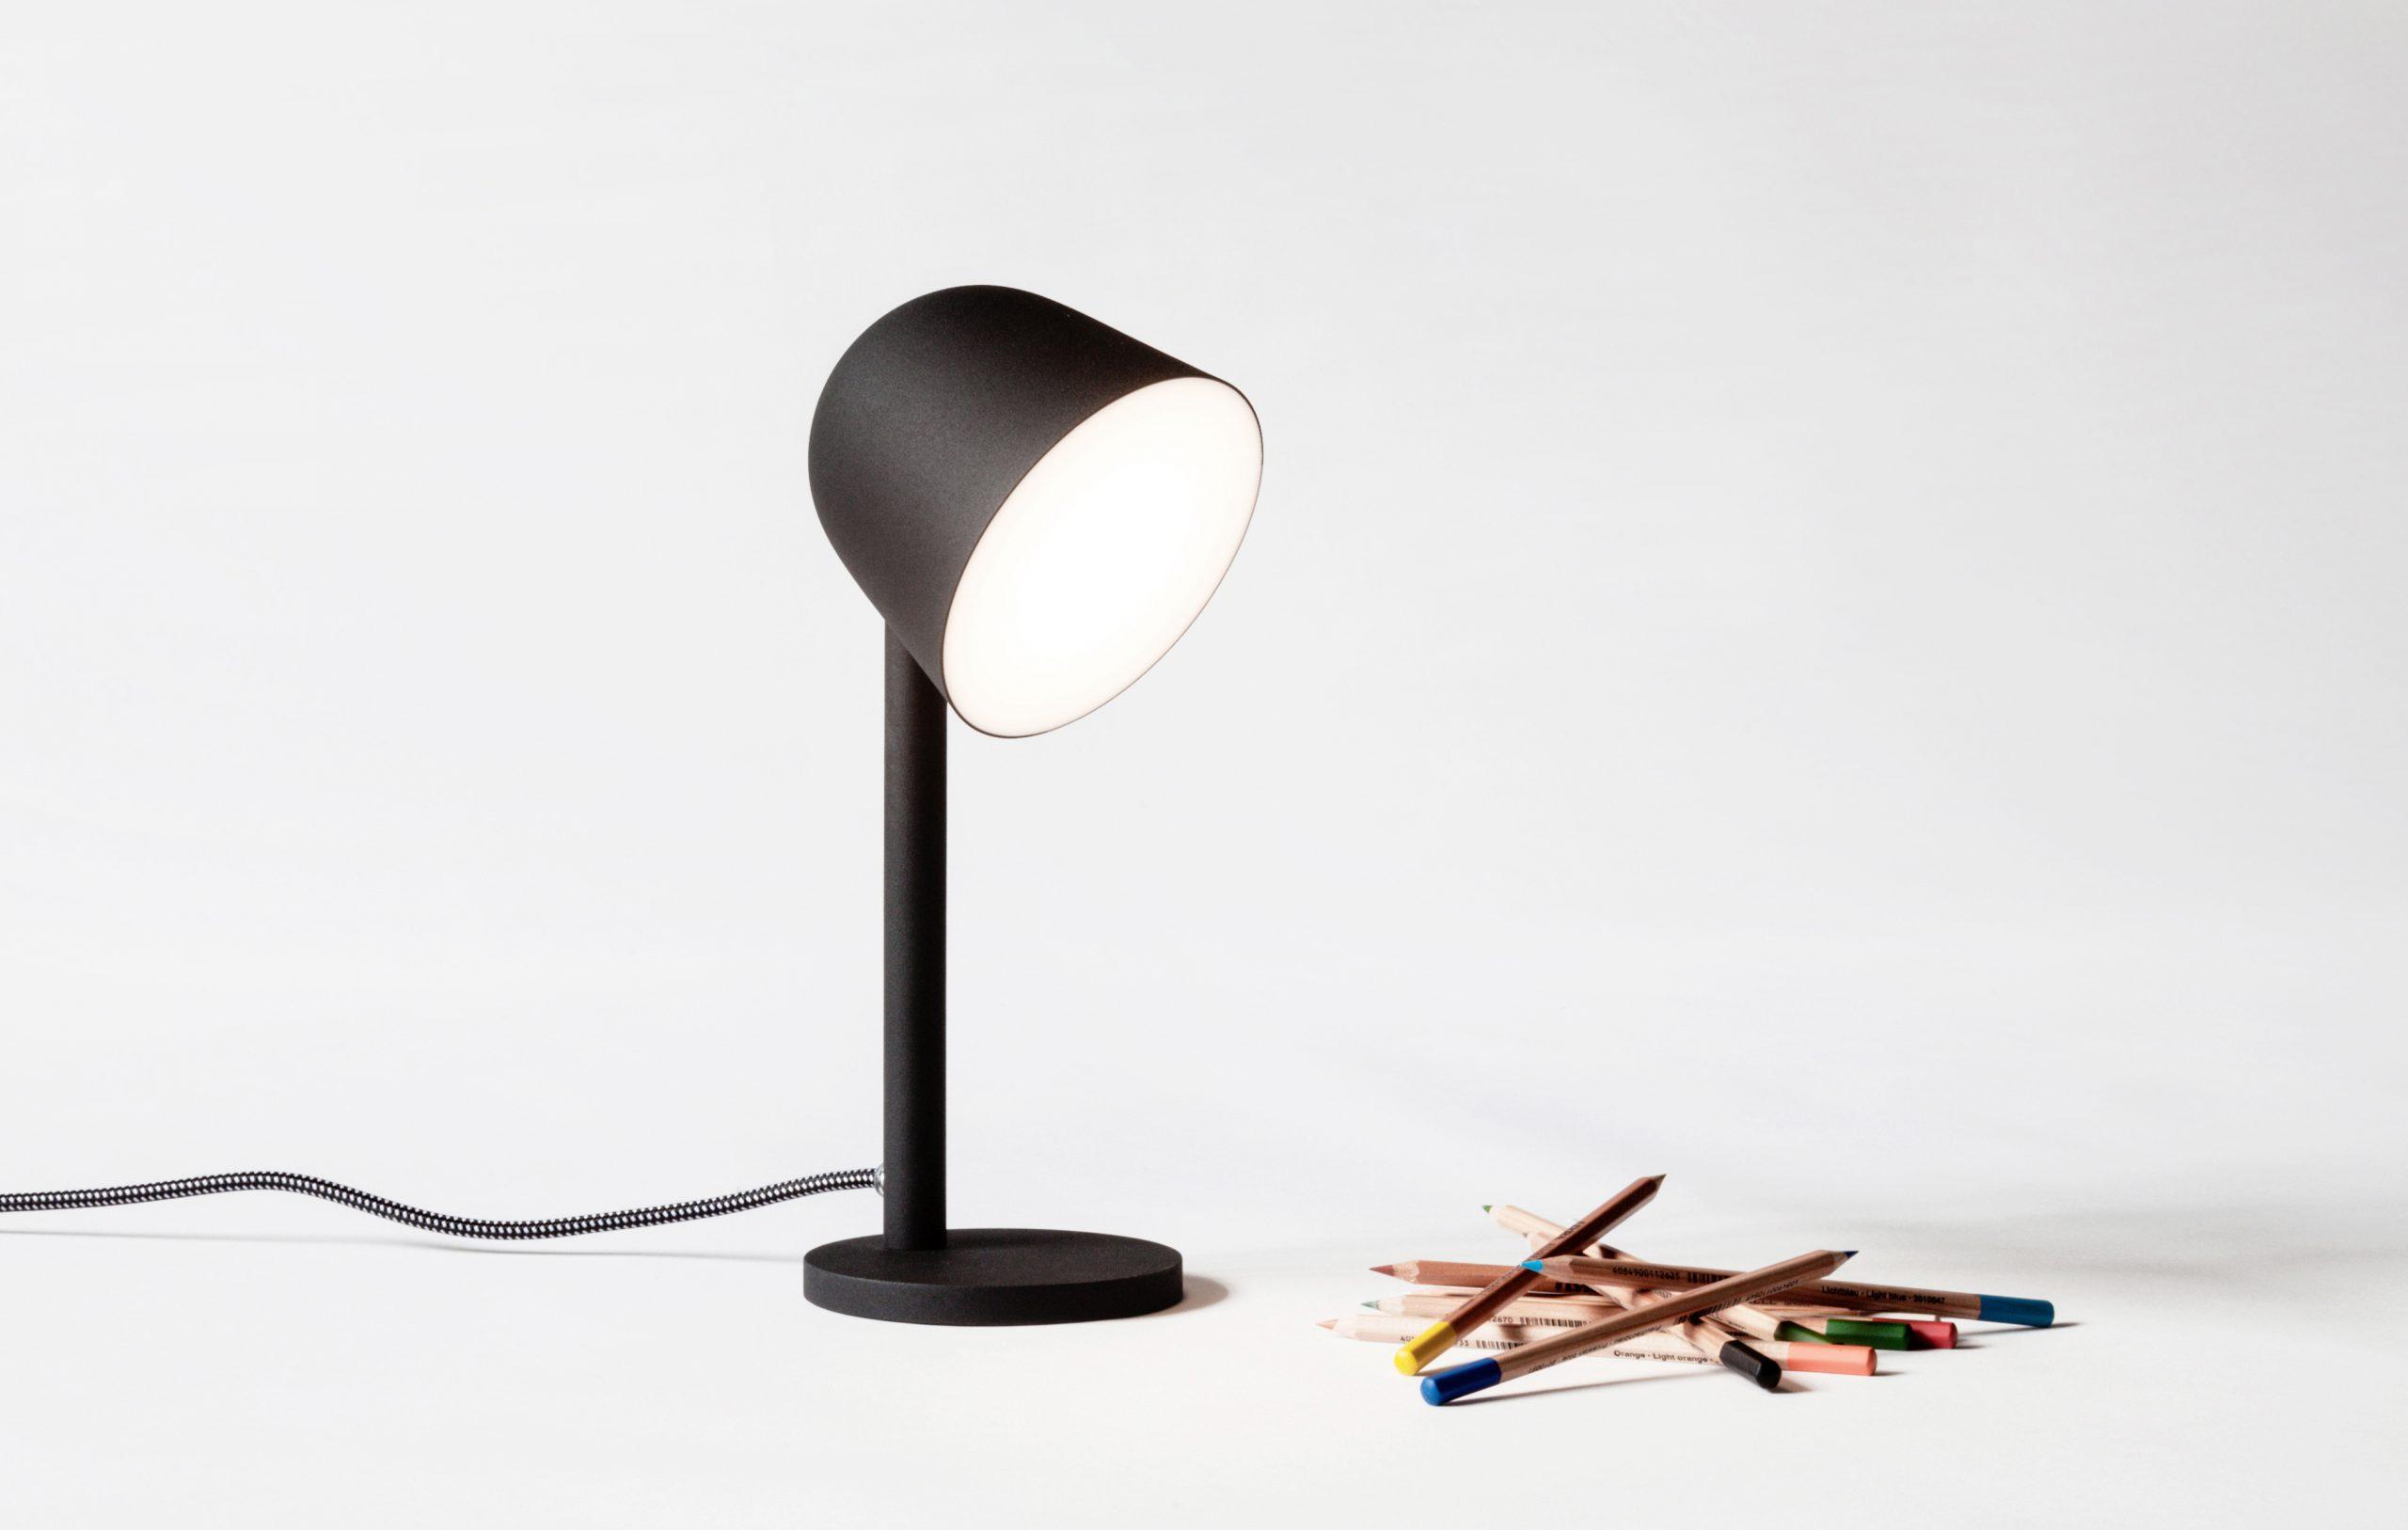 Black Campanule lamp by Debiasi sandri for Ligne Roset